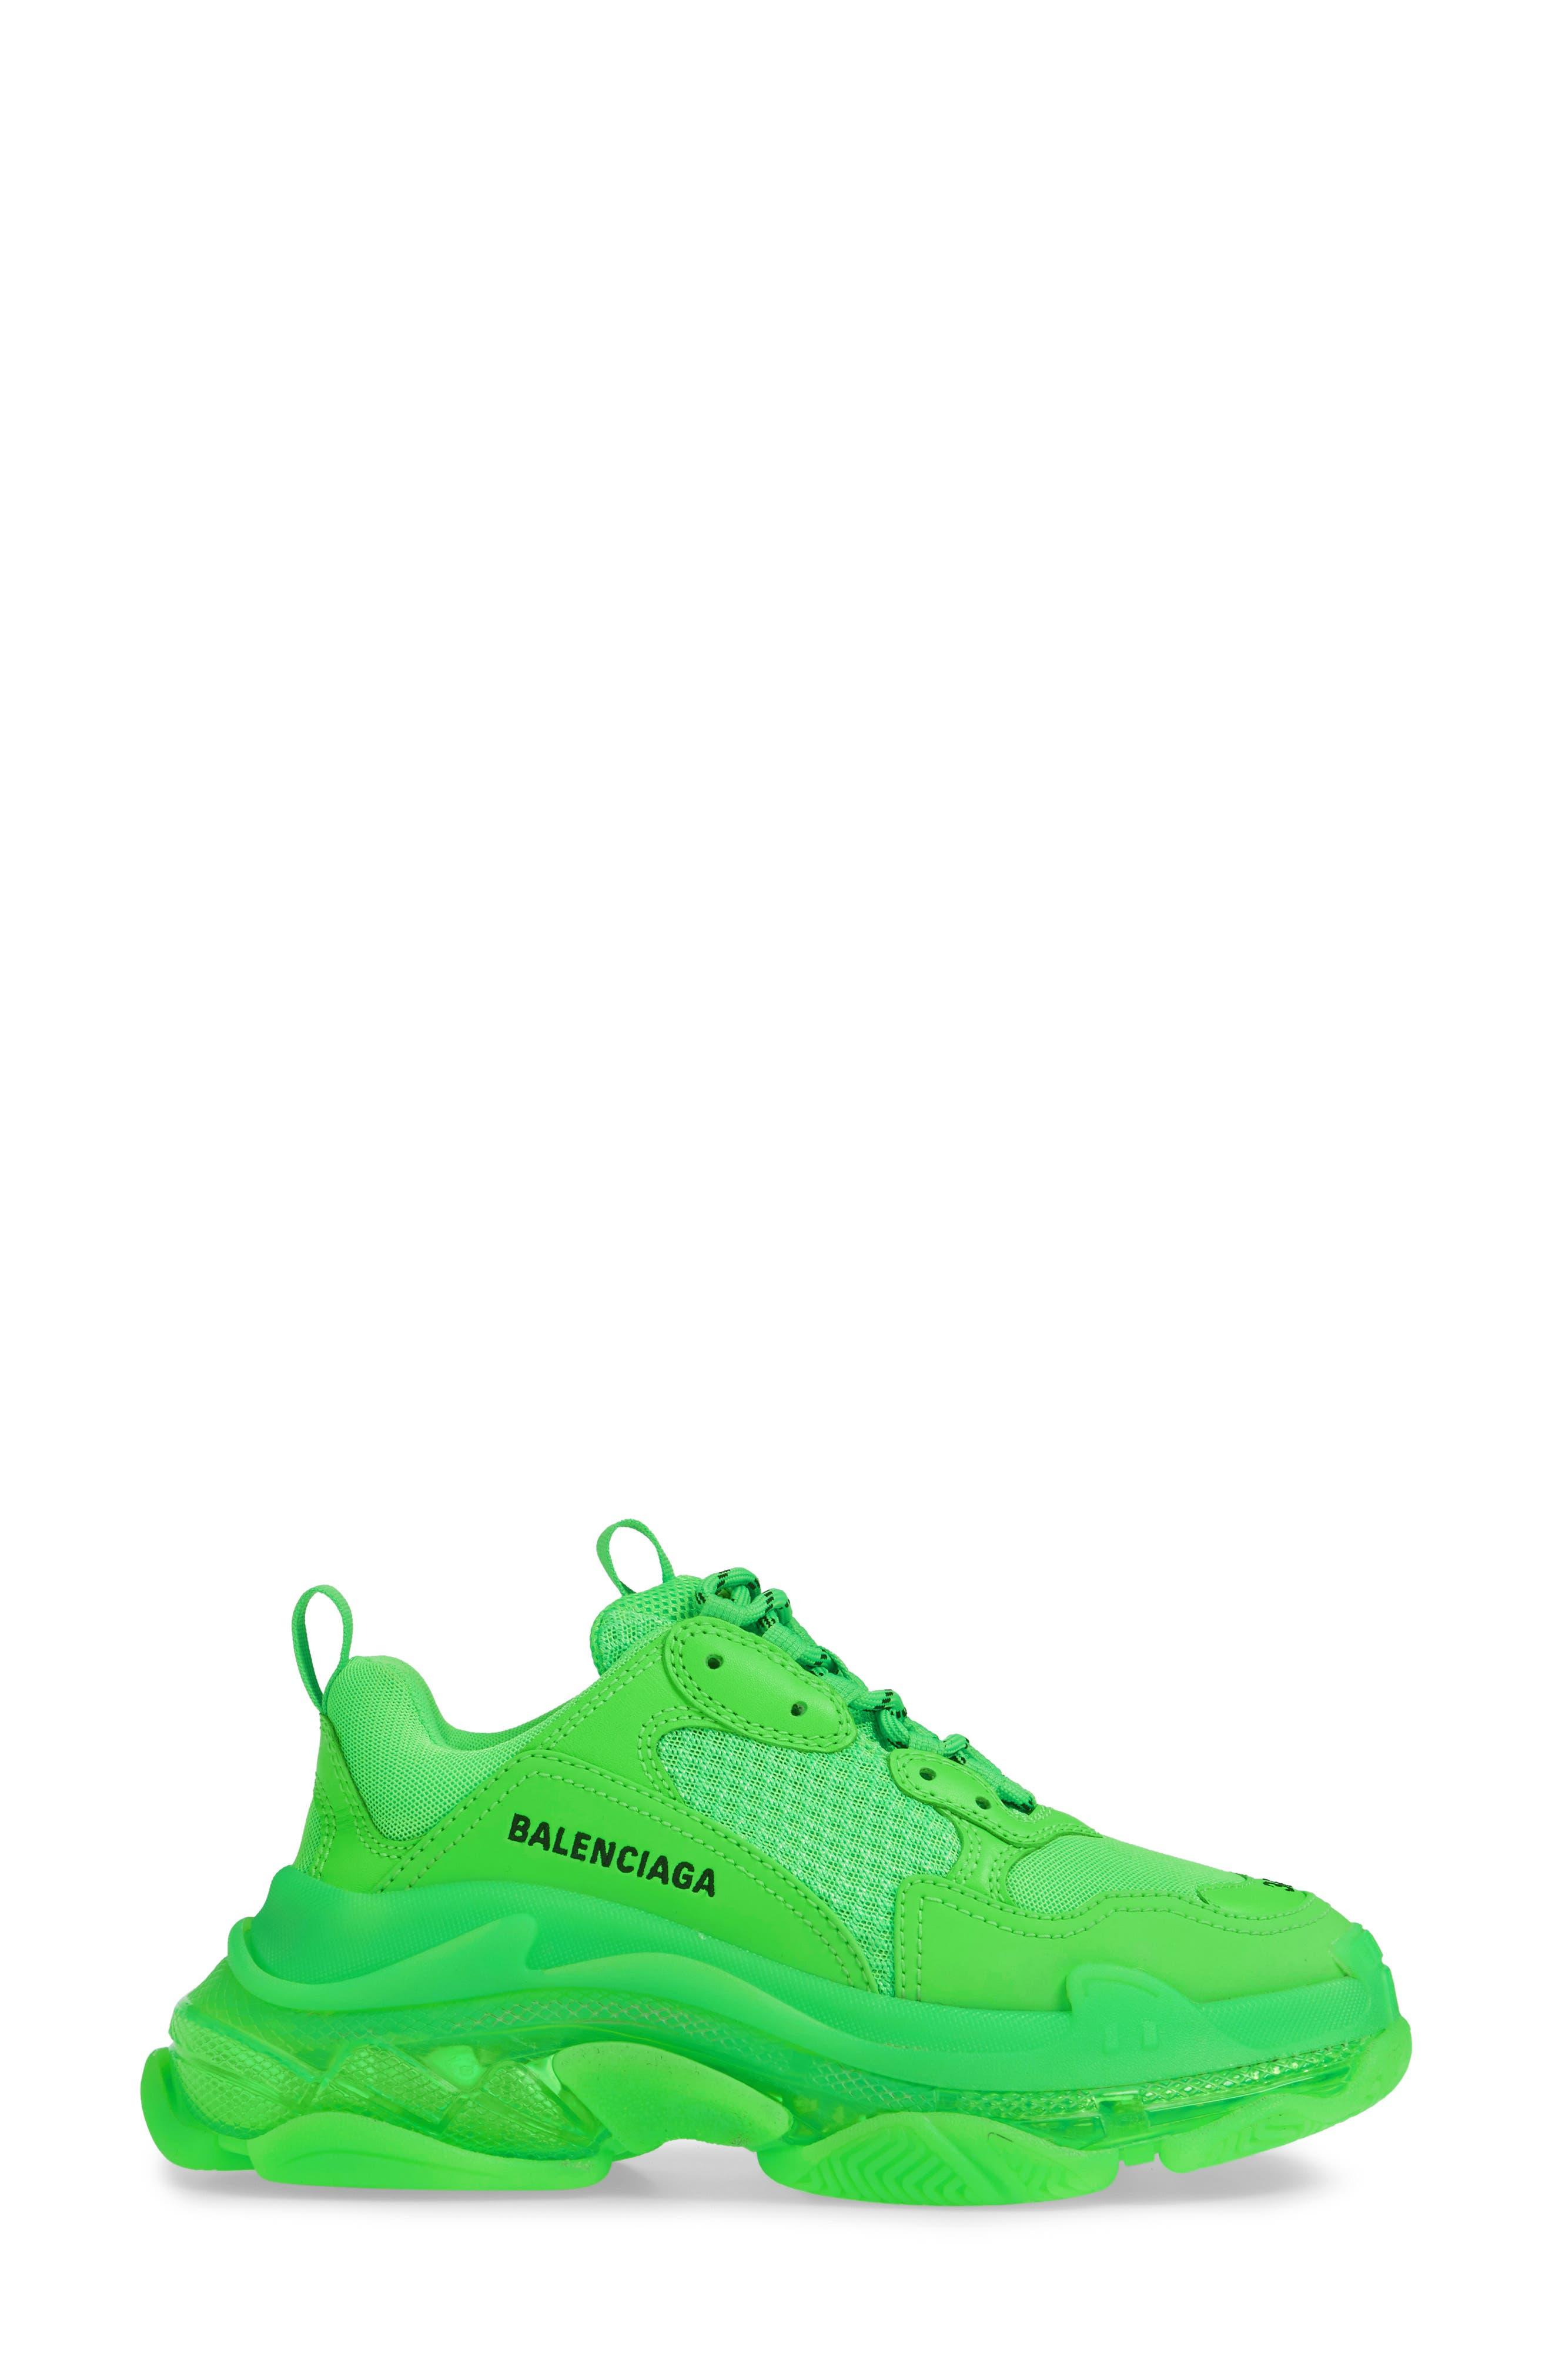 BALENCIAGA, Triple S Low Top Sneaker, Alternate thumbnail 3, color, GREEN FLUO